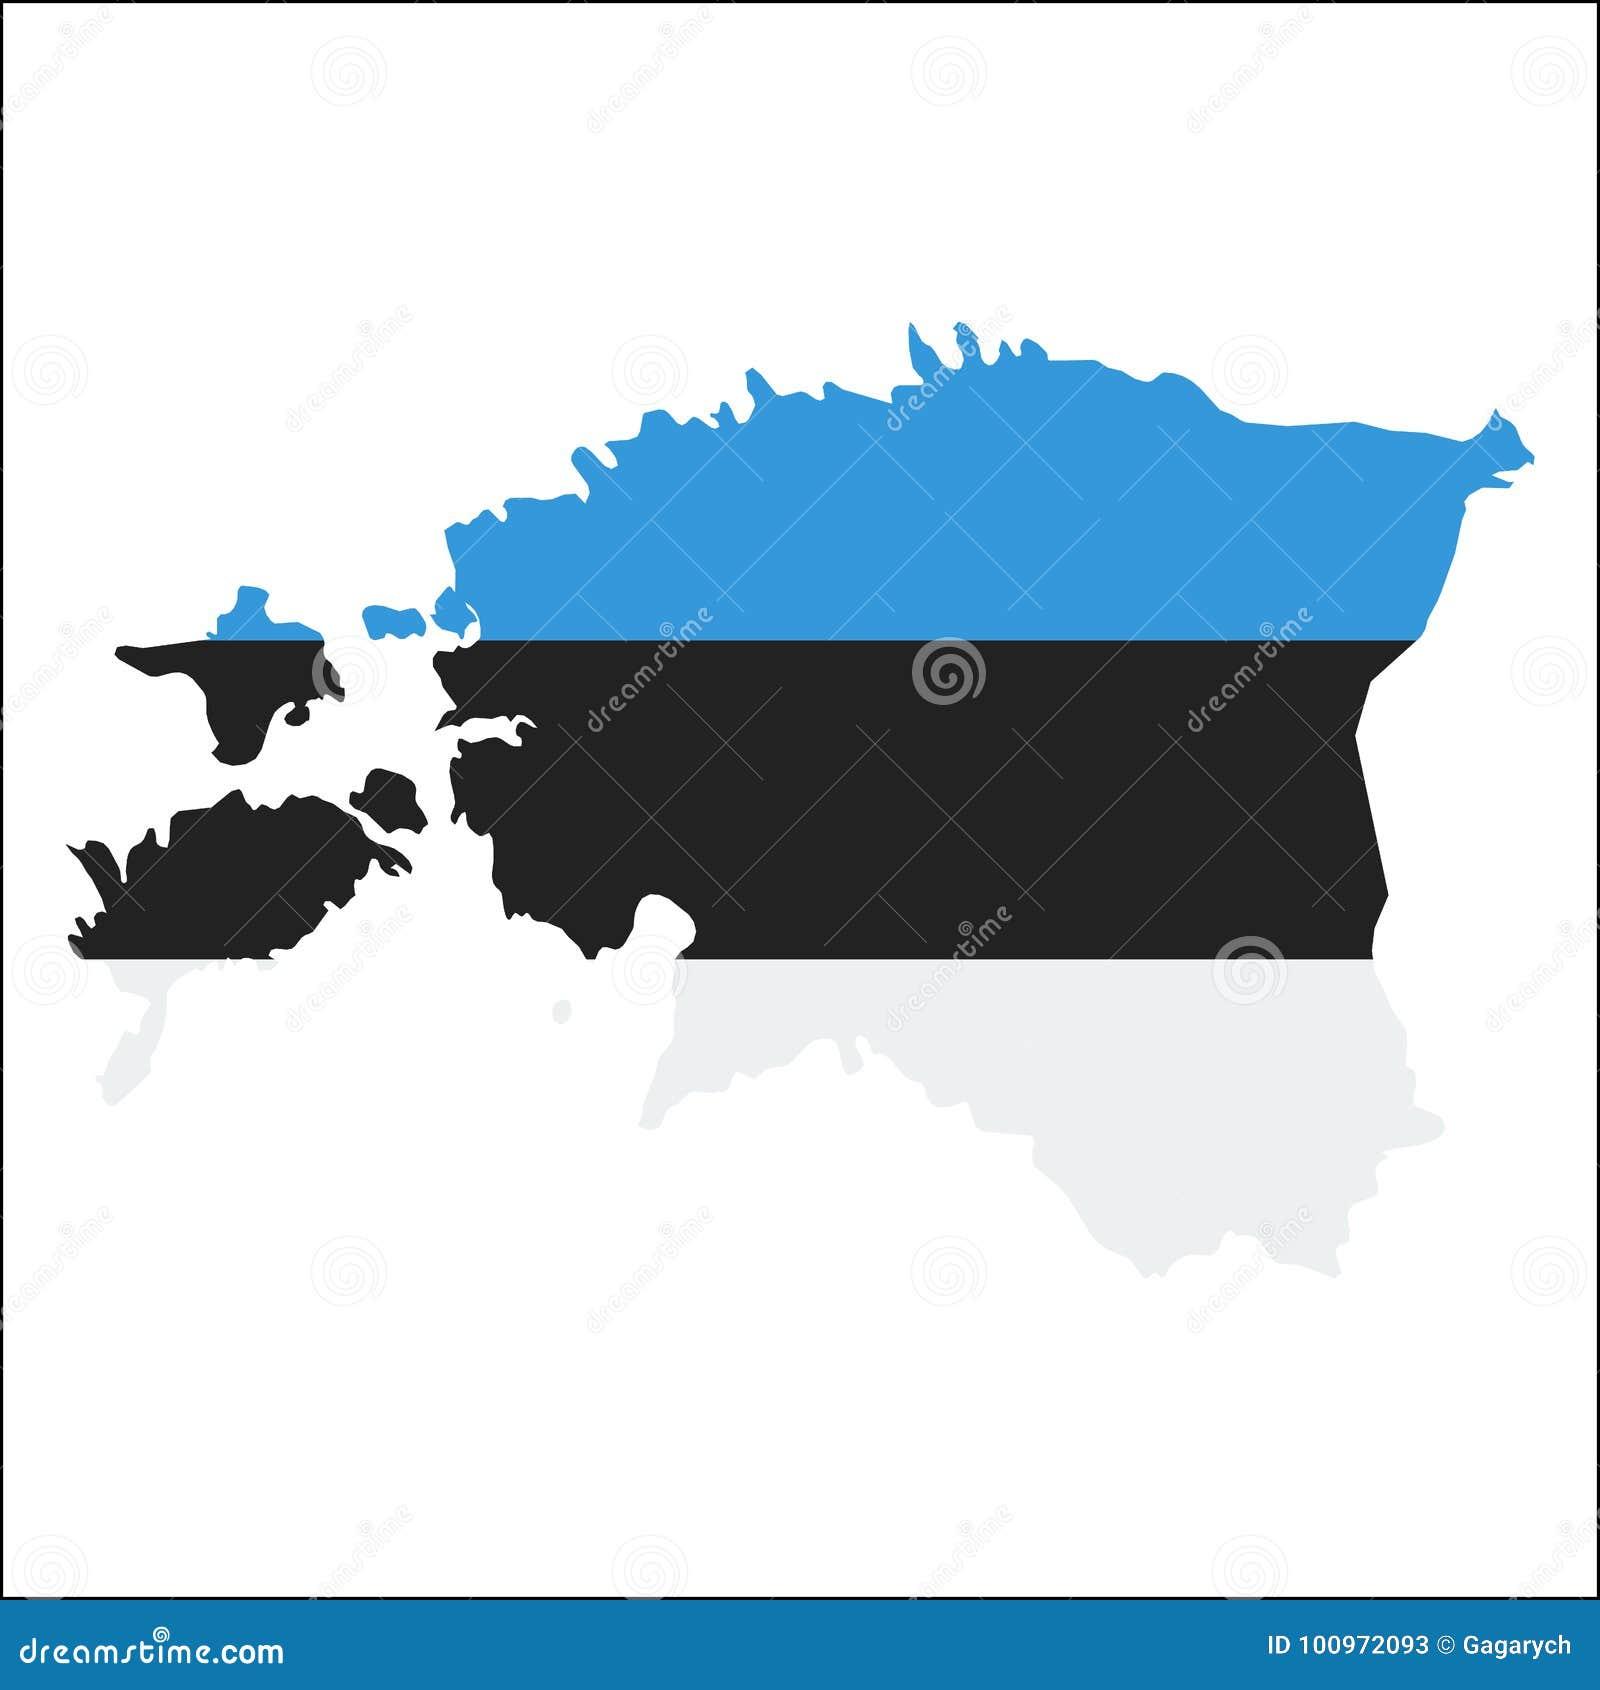 Estonia high resolution map with national flag stock vector estonia high resolution map with national flag gumiabroncs Choice Image